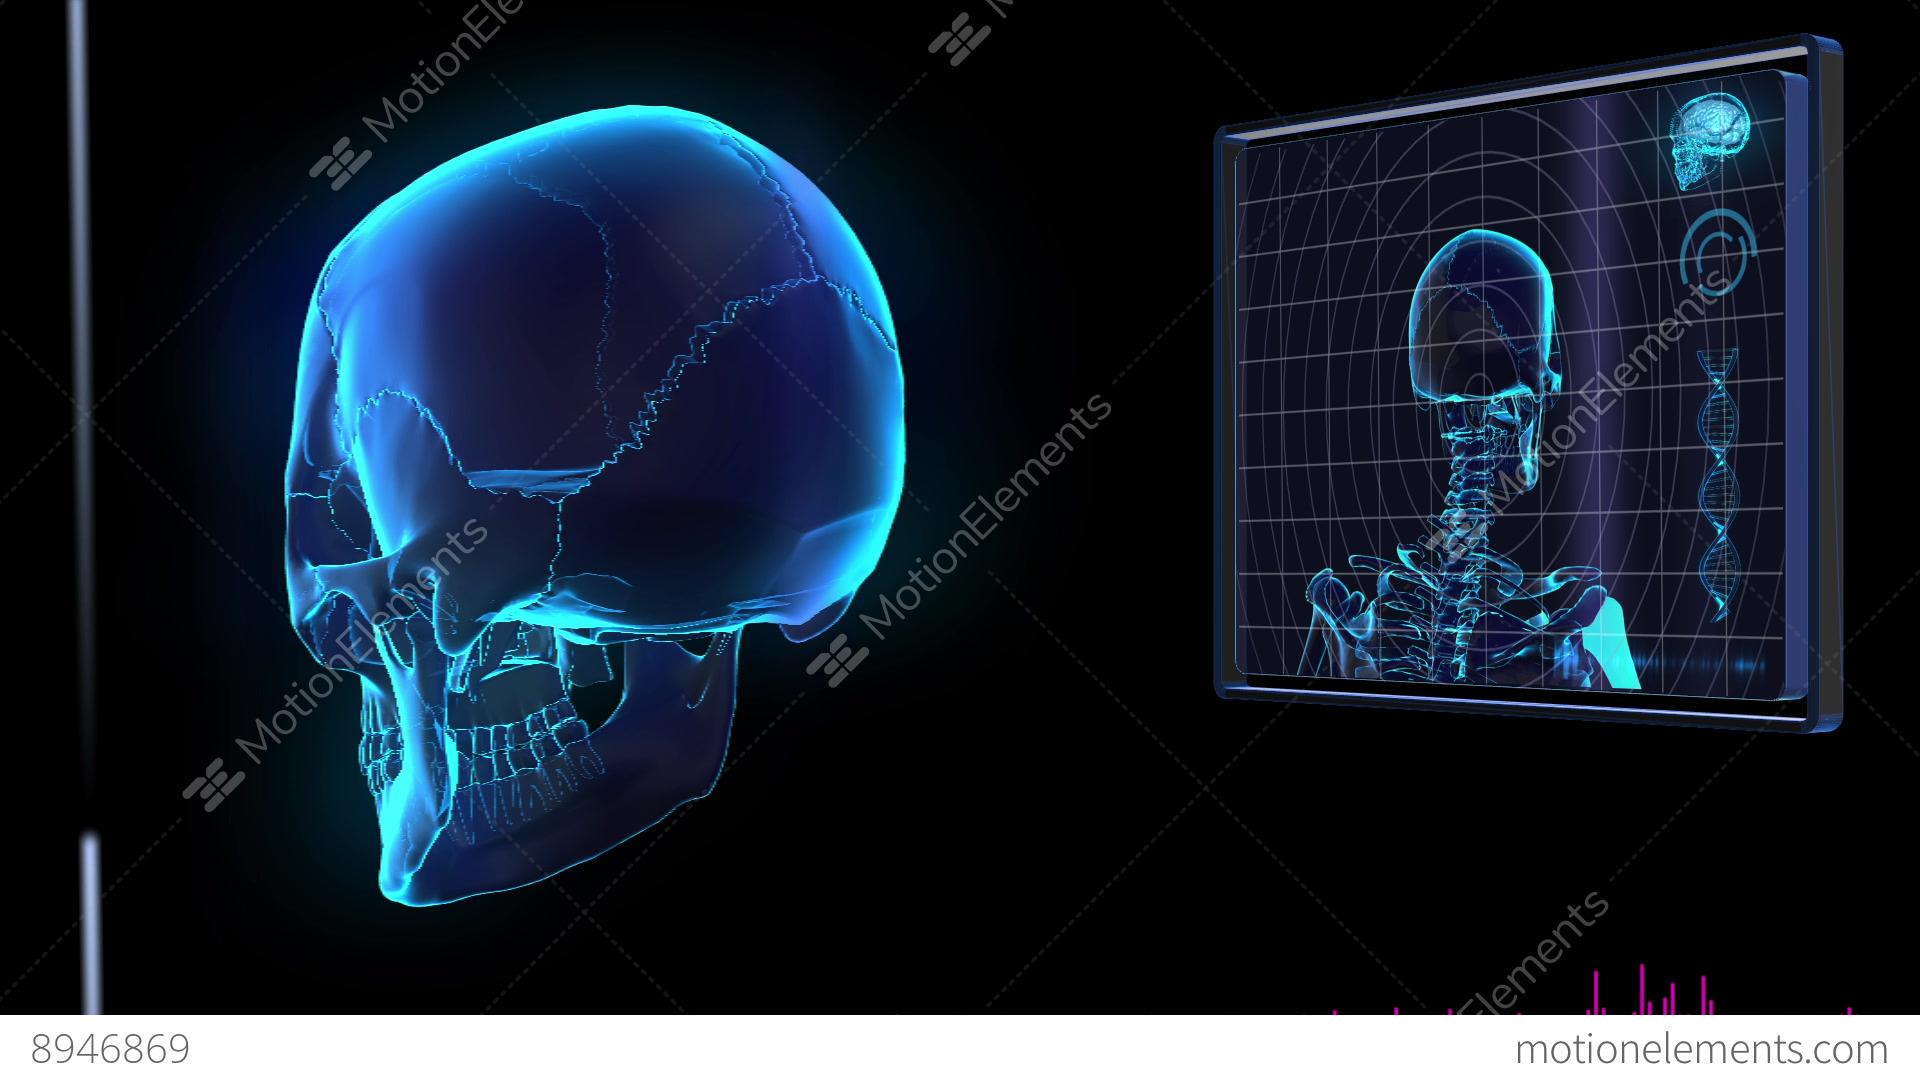 me8946869-science-fiction-medical-design-element-human-skull-hud-panel-india-hd-a0098.jpg